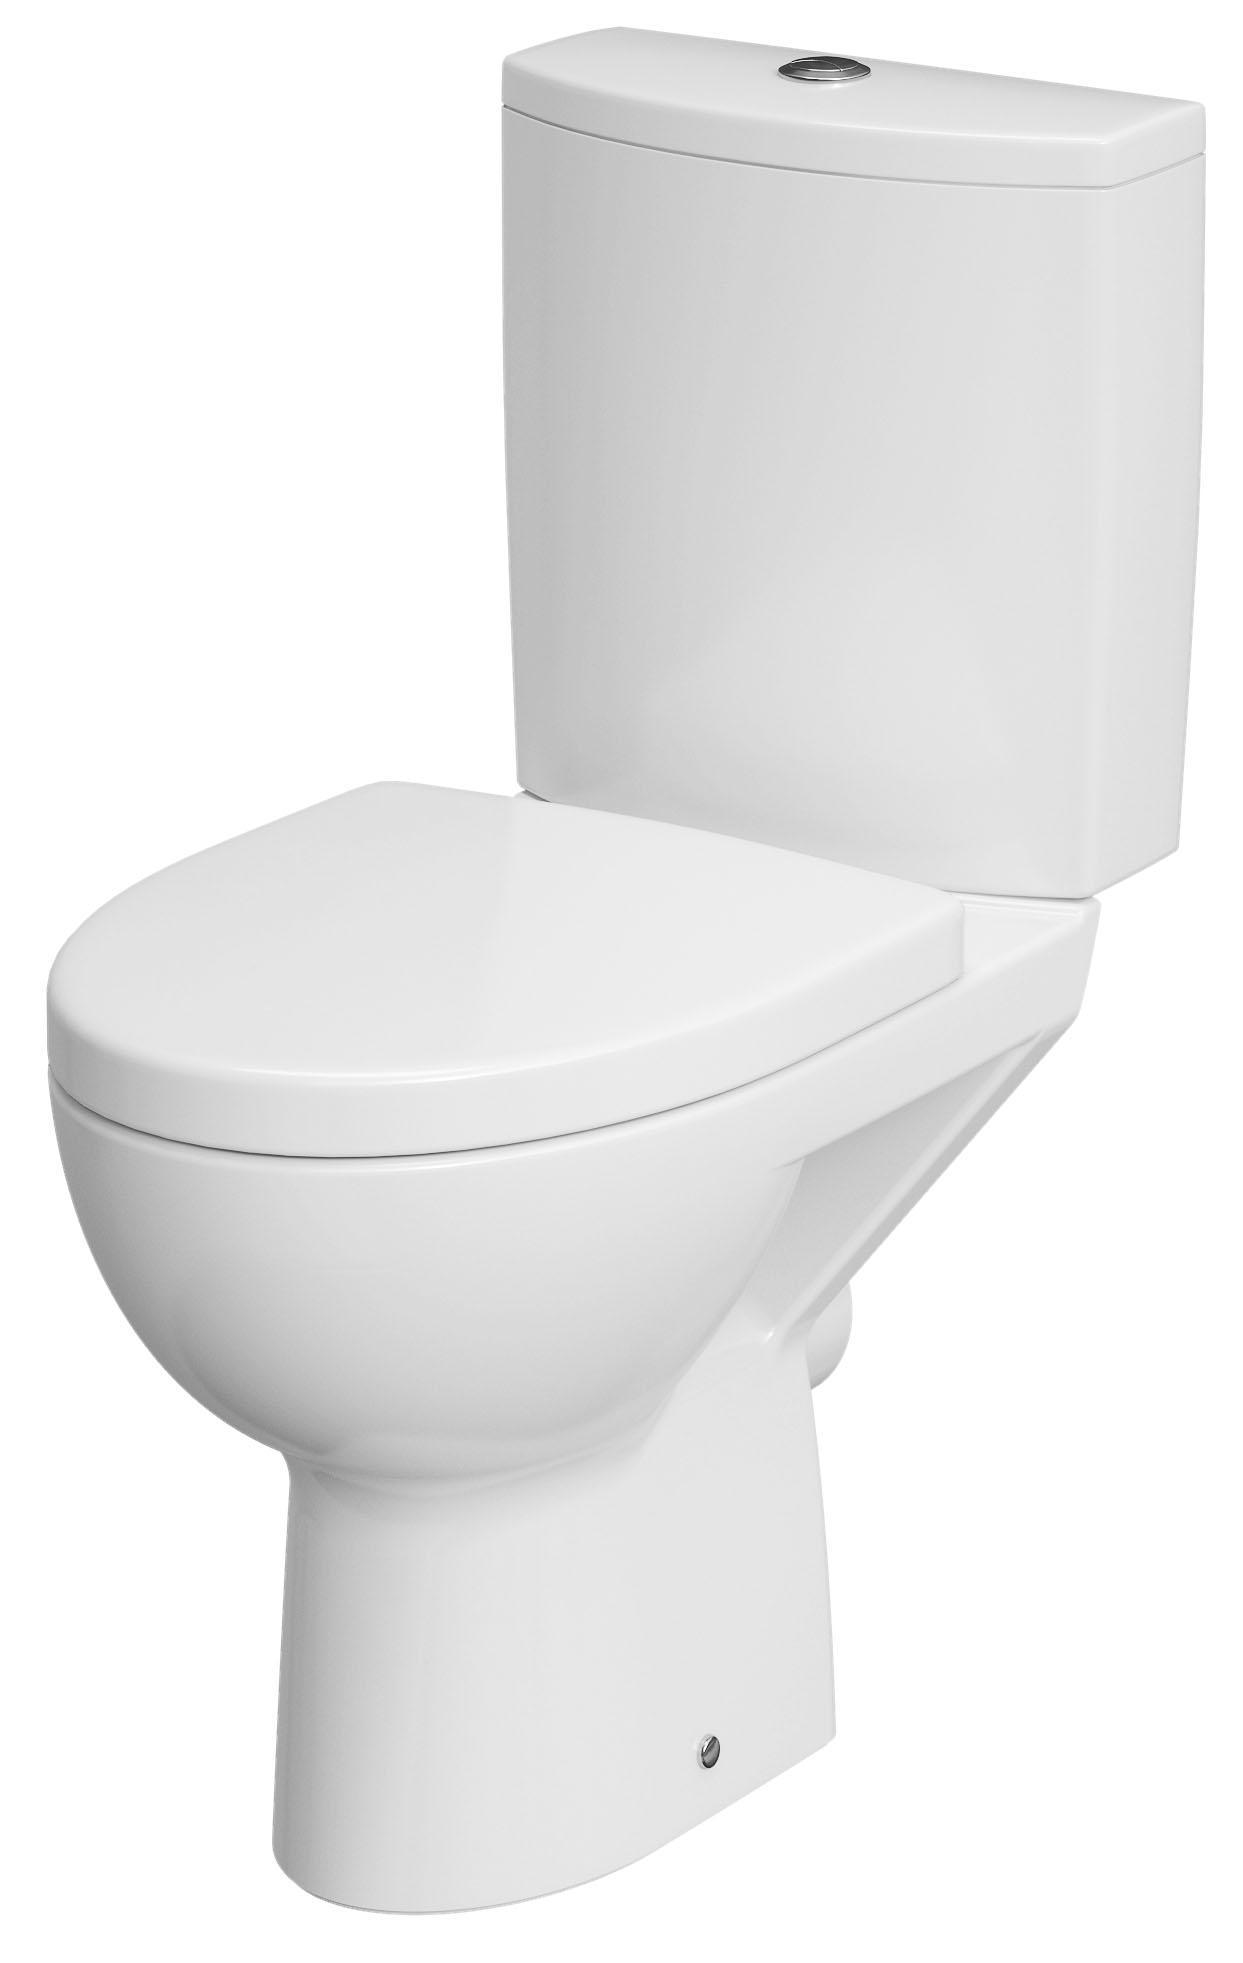 cornat stand wc set montego sp lrandlos toilette tiefsp ler toilette mit wc sitz. Black Bedroom Furniture Sets. Home Design Ideas